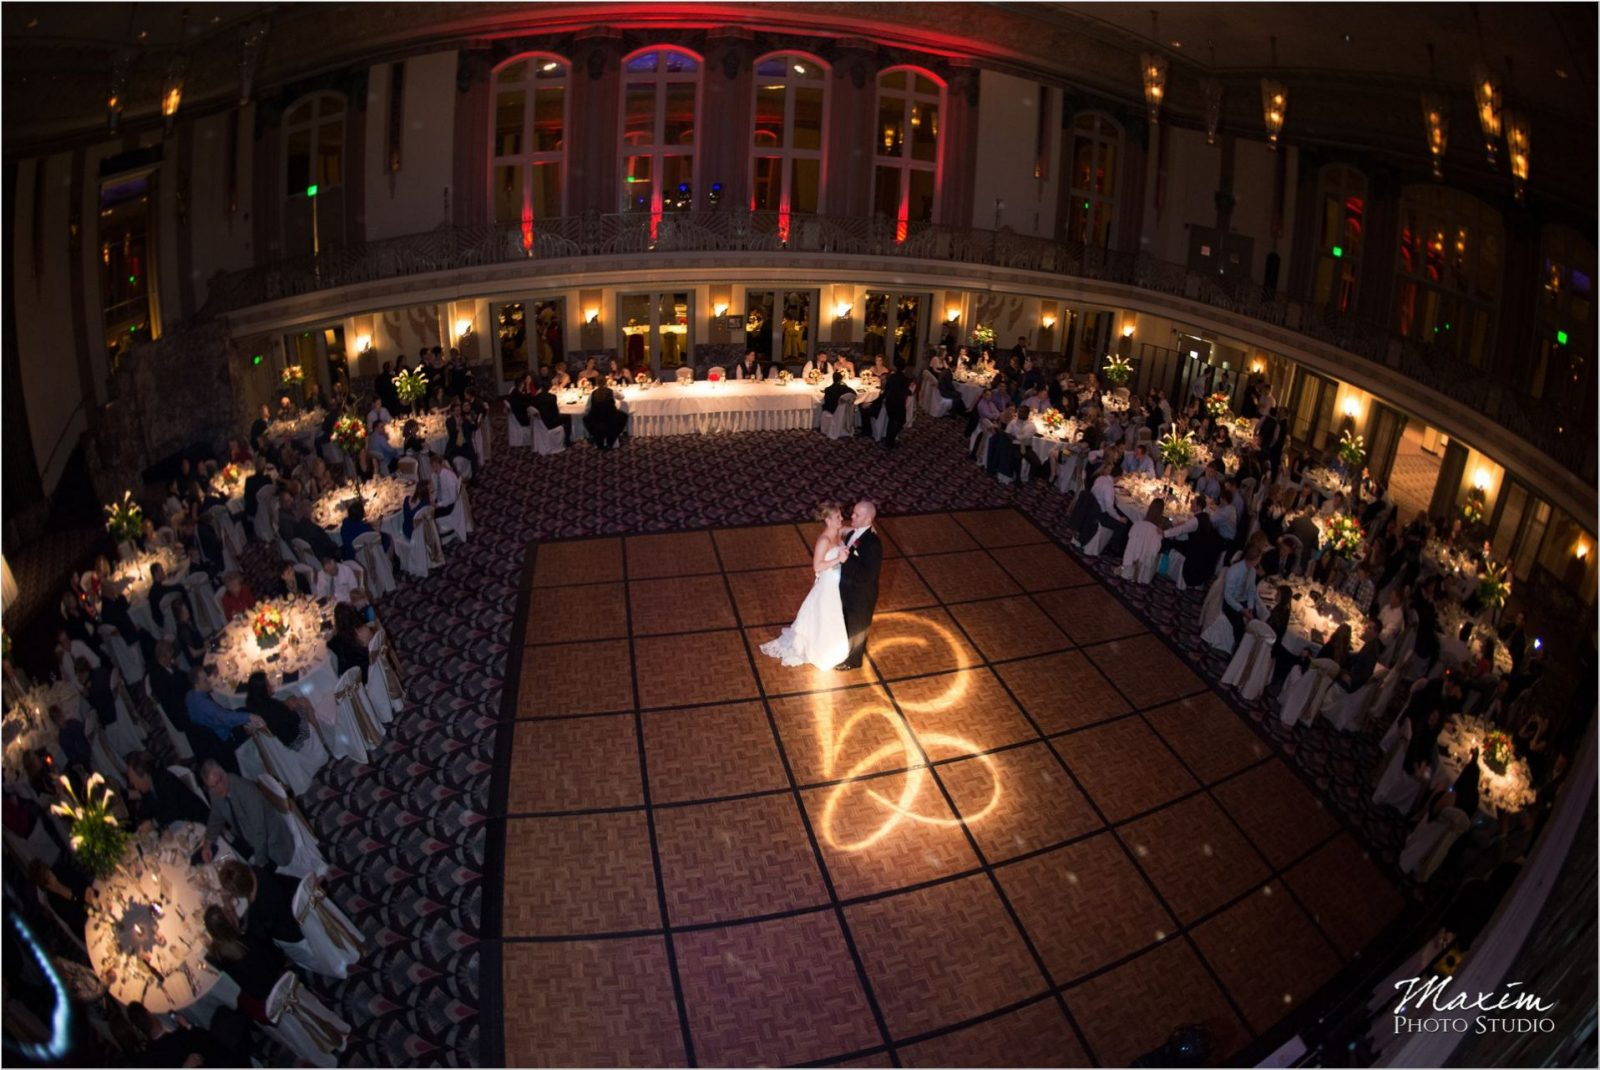 Hilton Netherland Plaza Cincinnati Wedding Reception dance